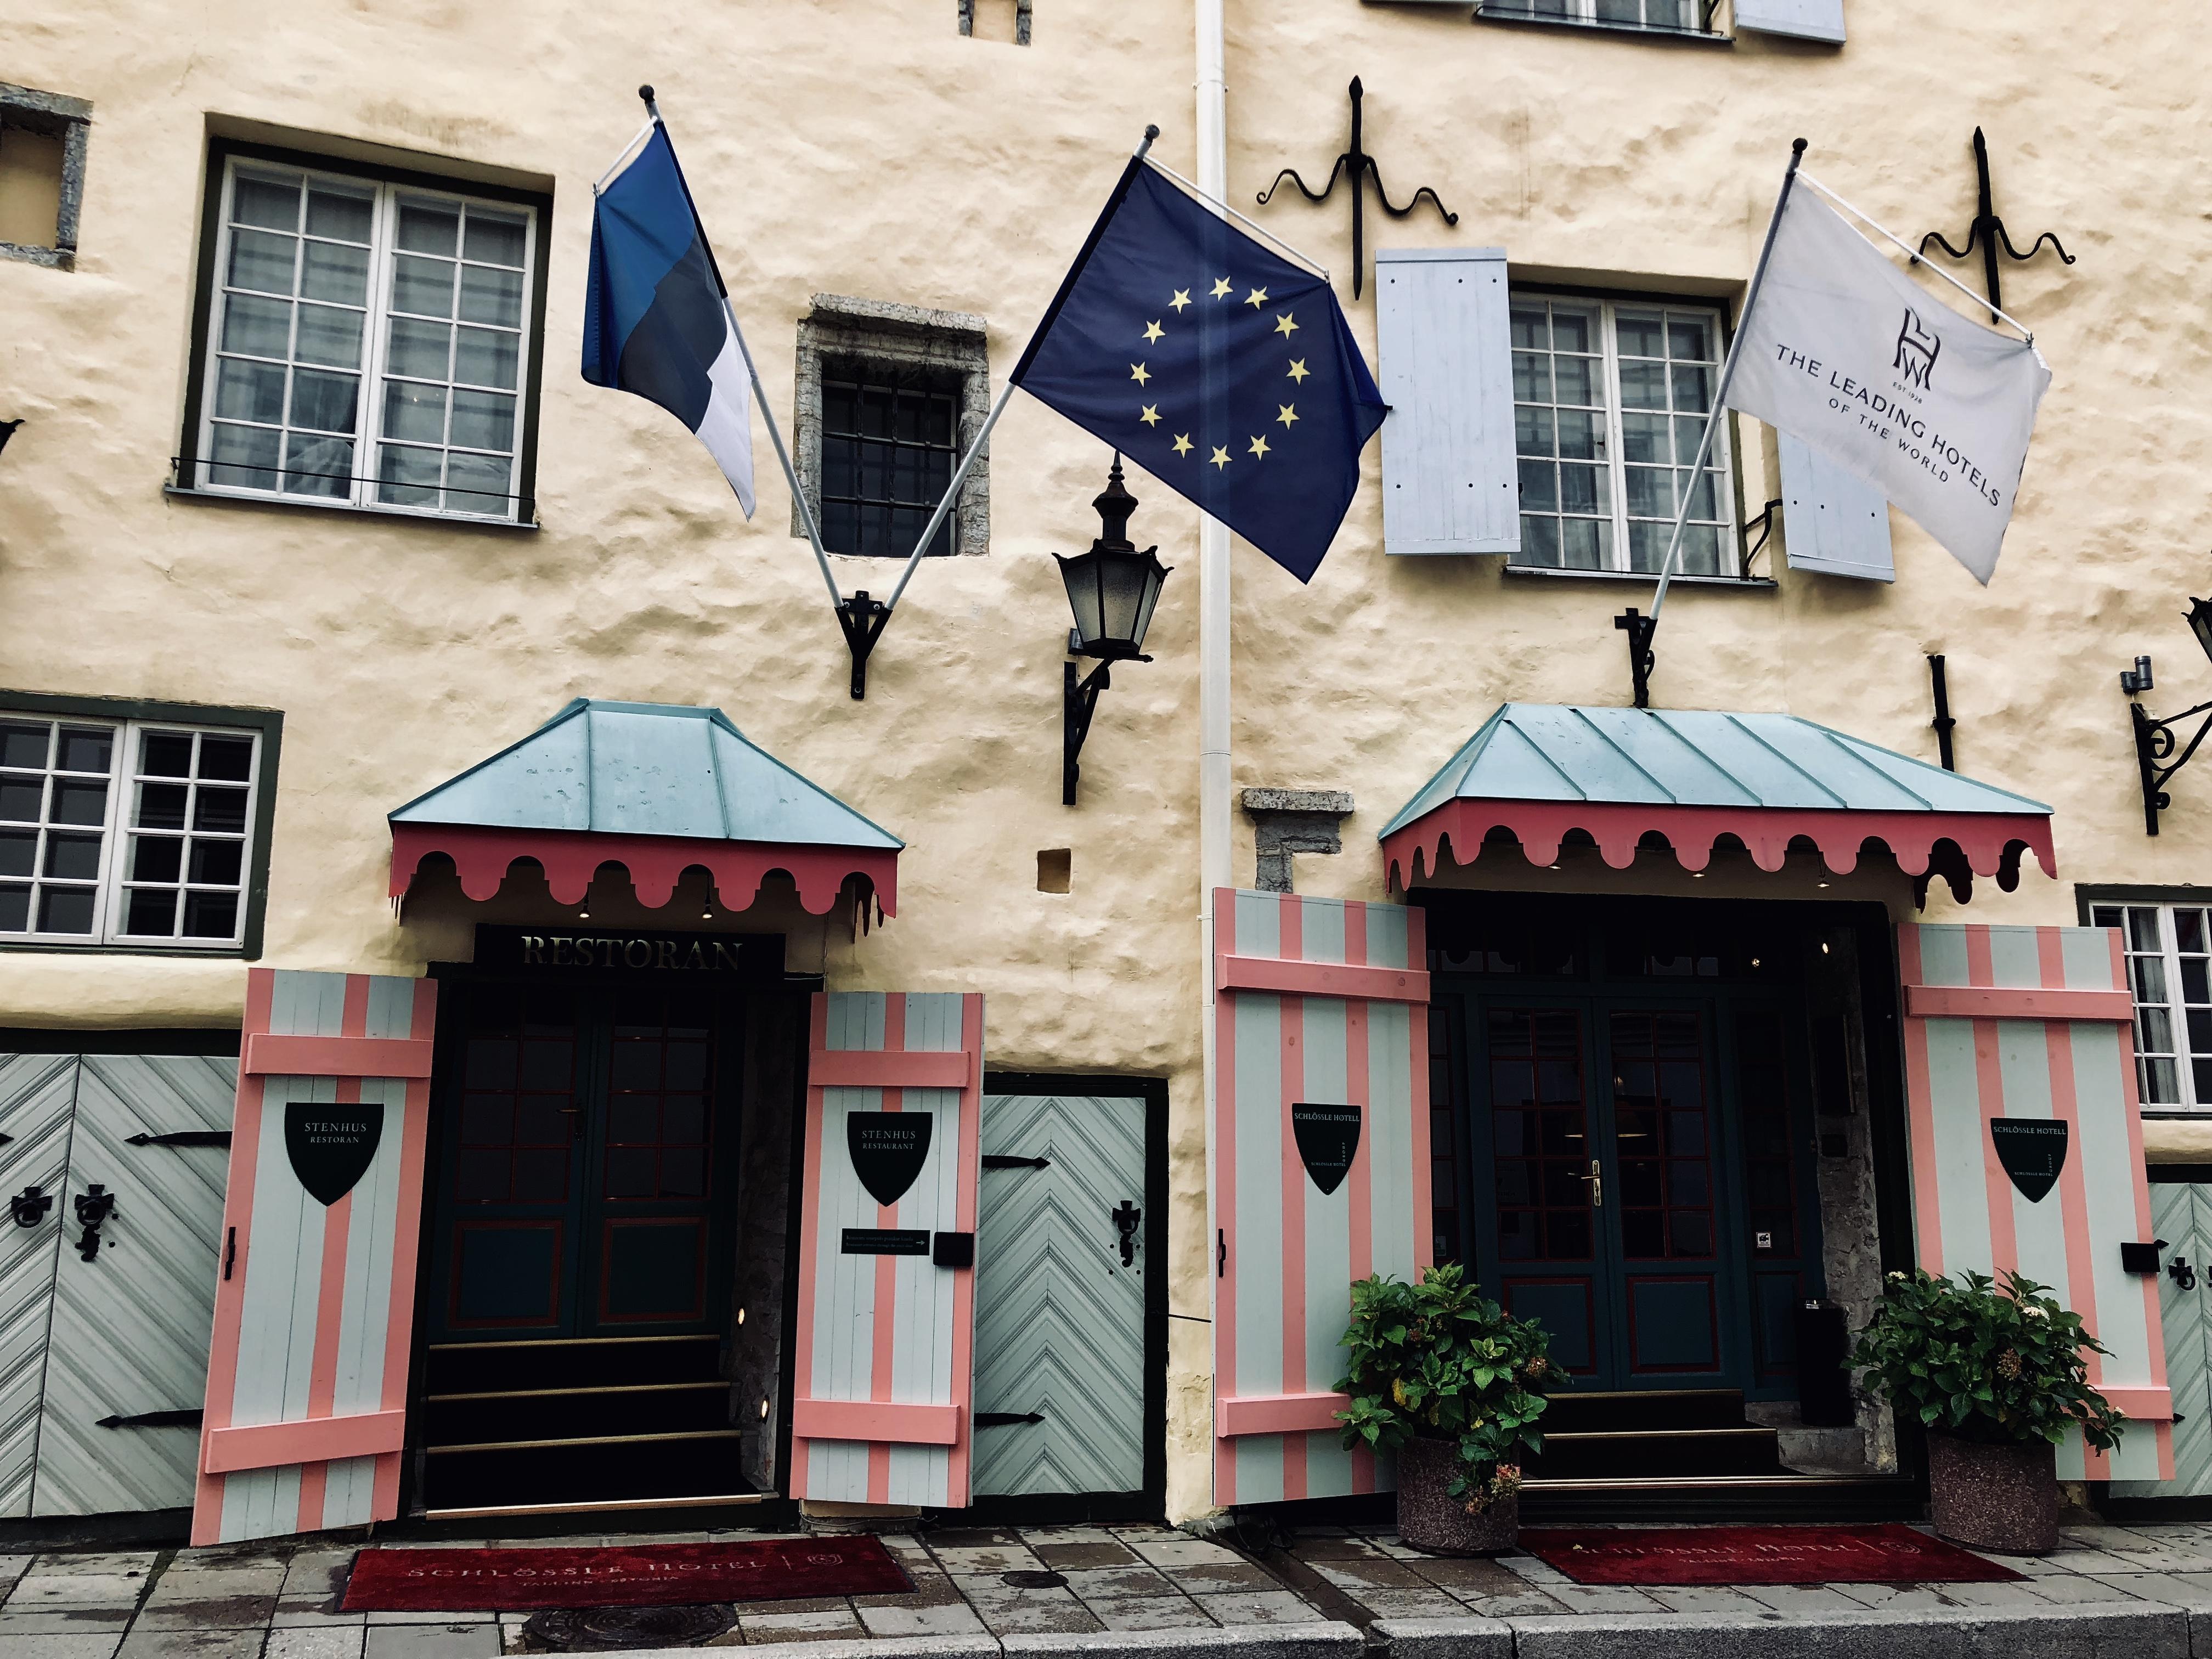 Travel Diary 48 Stunden in Tallinn Schlössle Hotel